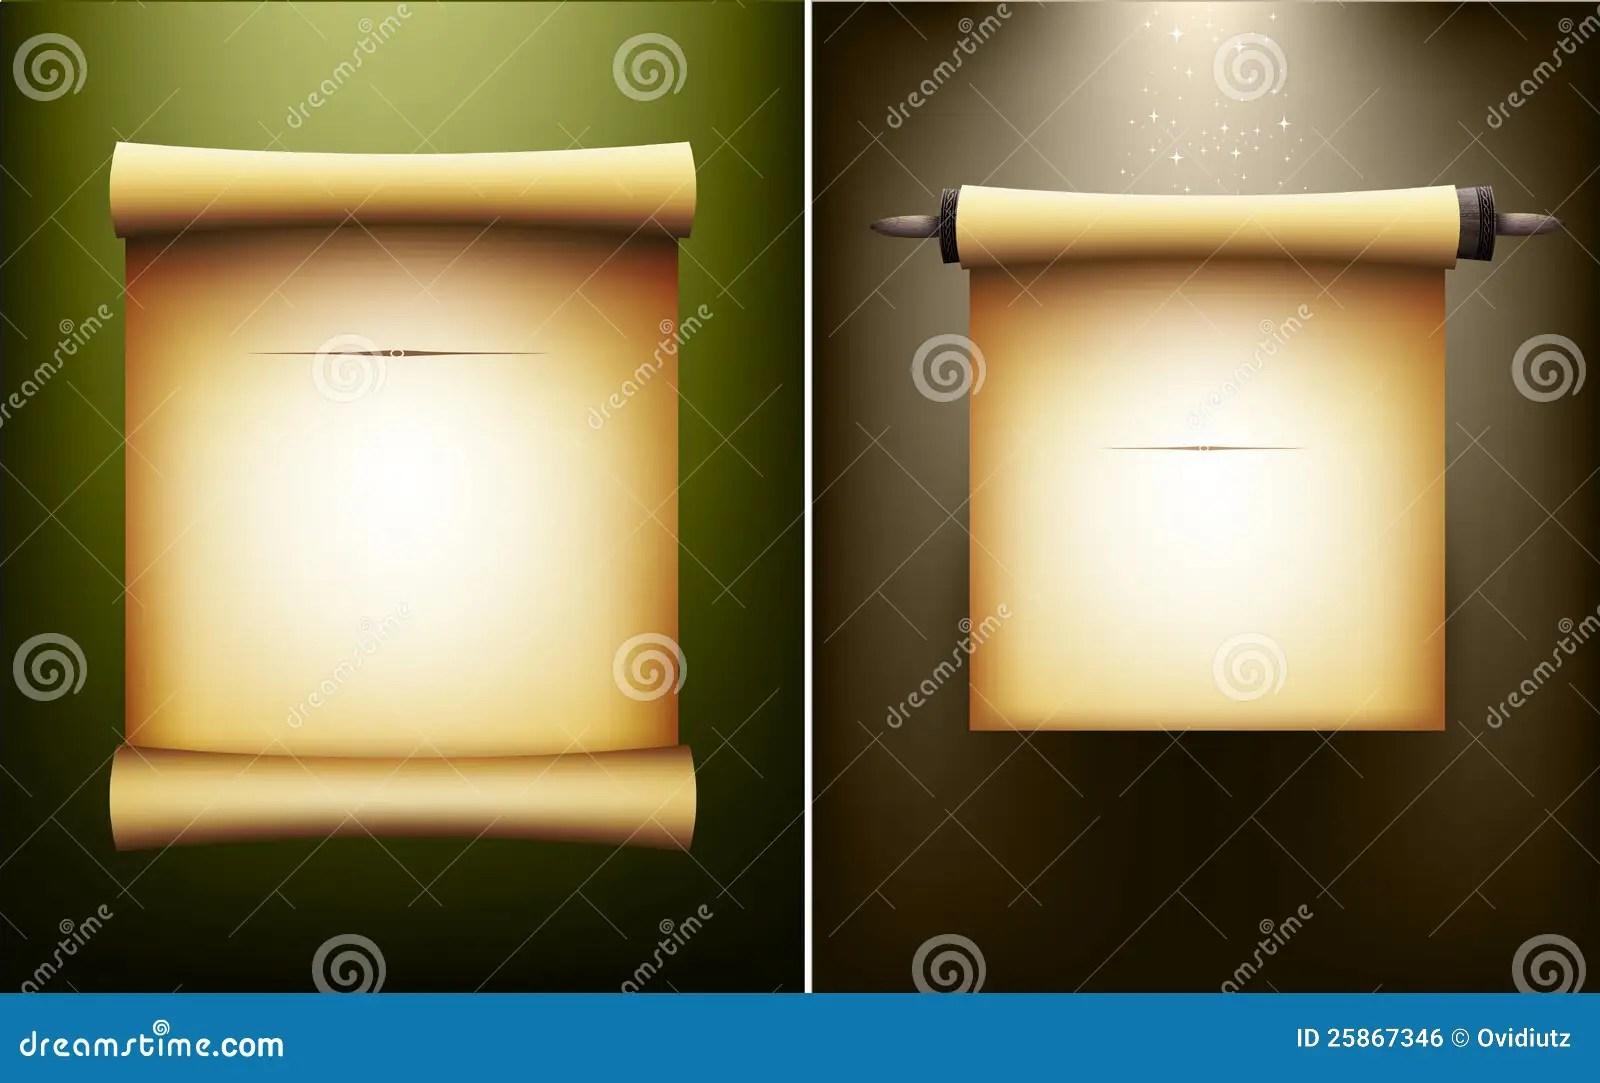 Web Site Paper Design Template Stock Vector Illustration Of Idea Gallery 25867346